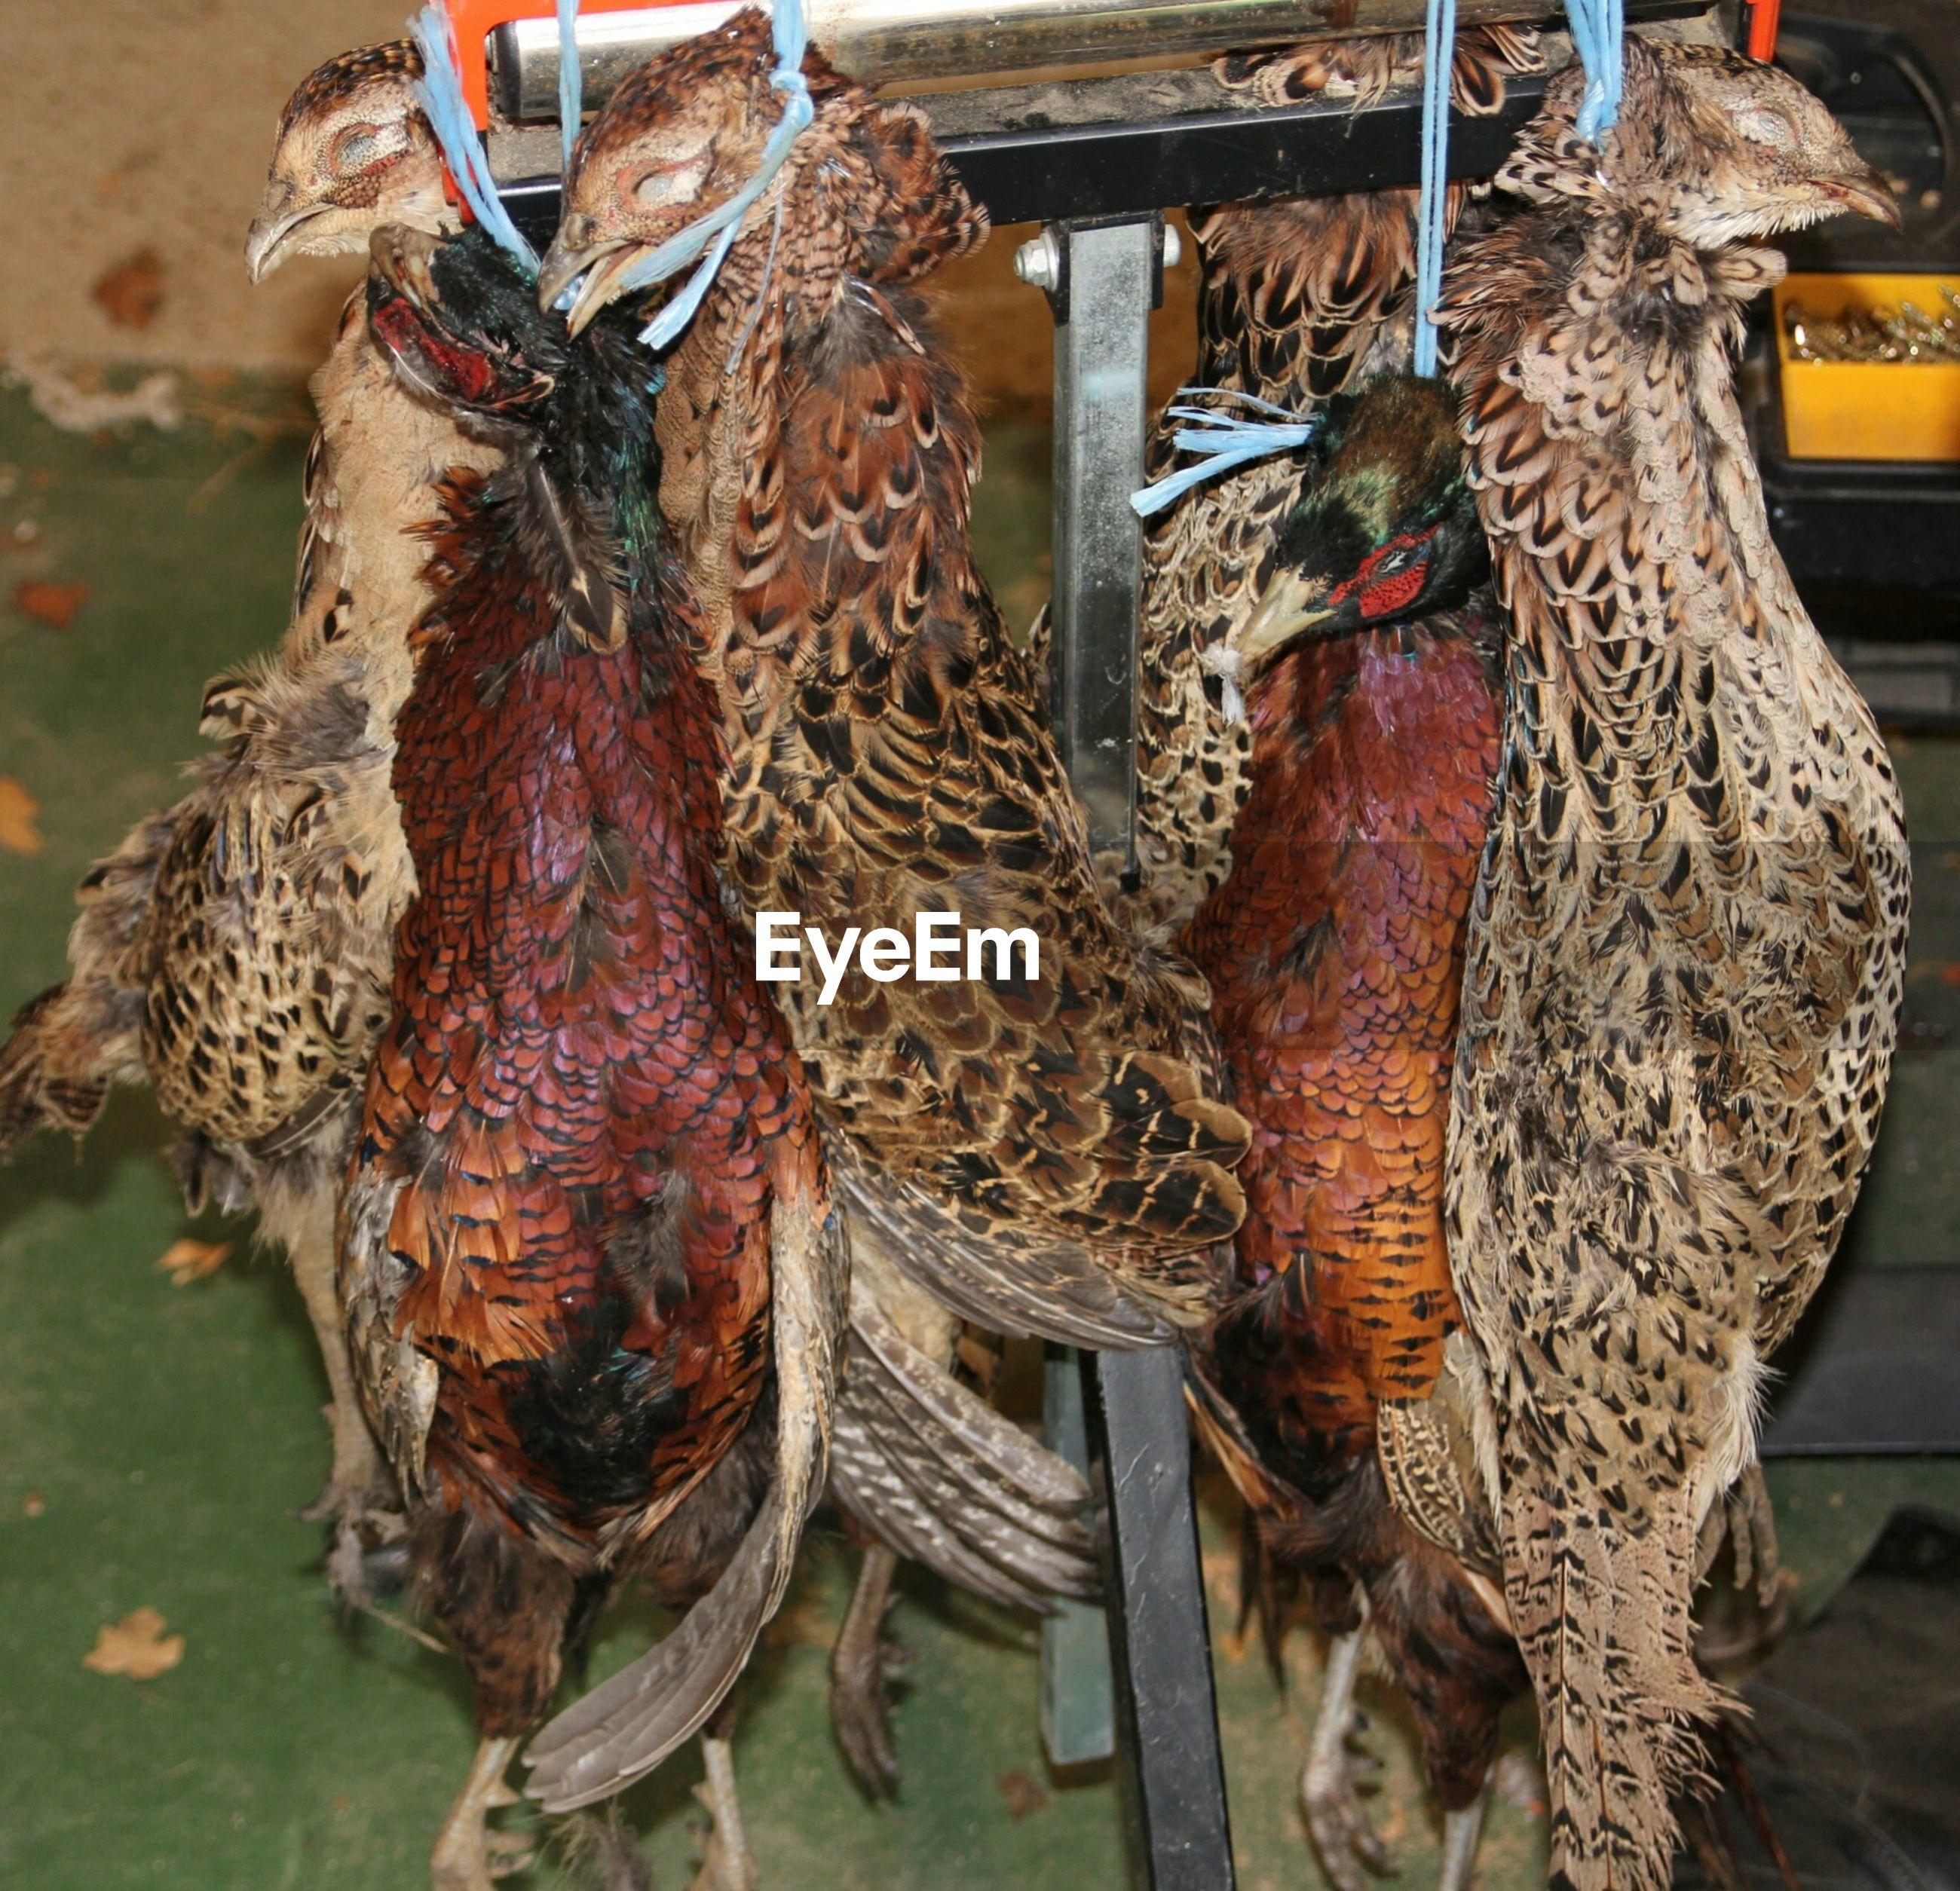 Dead pheasants hanging on wood